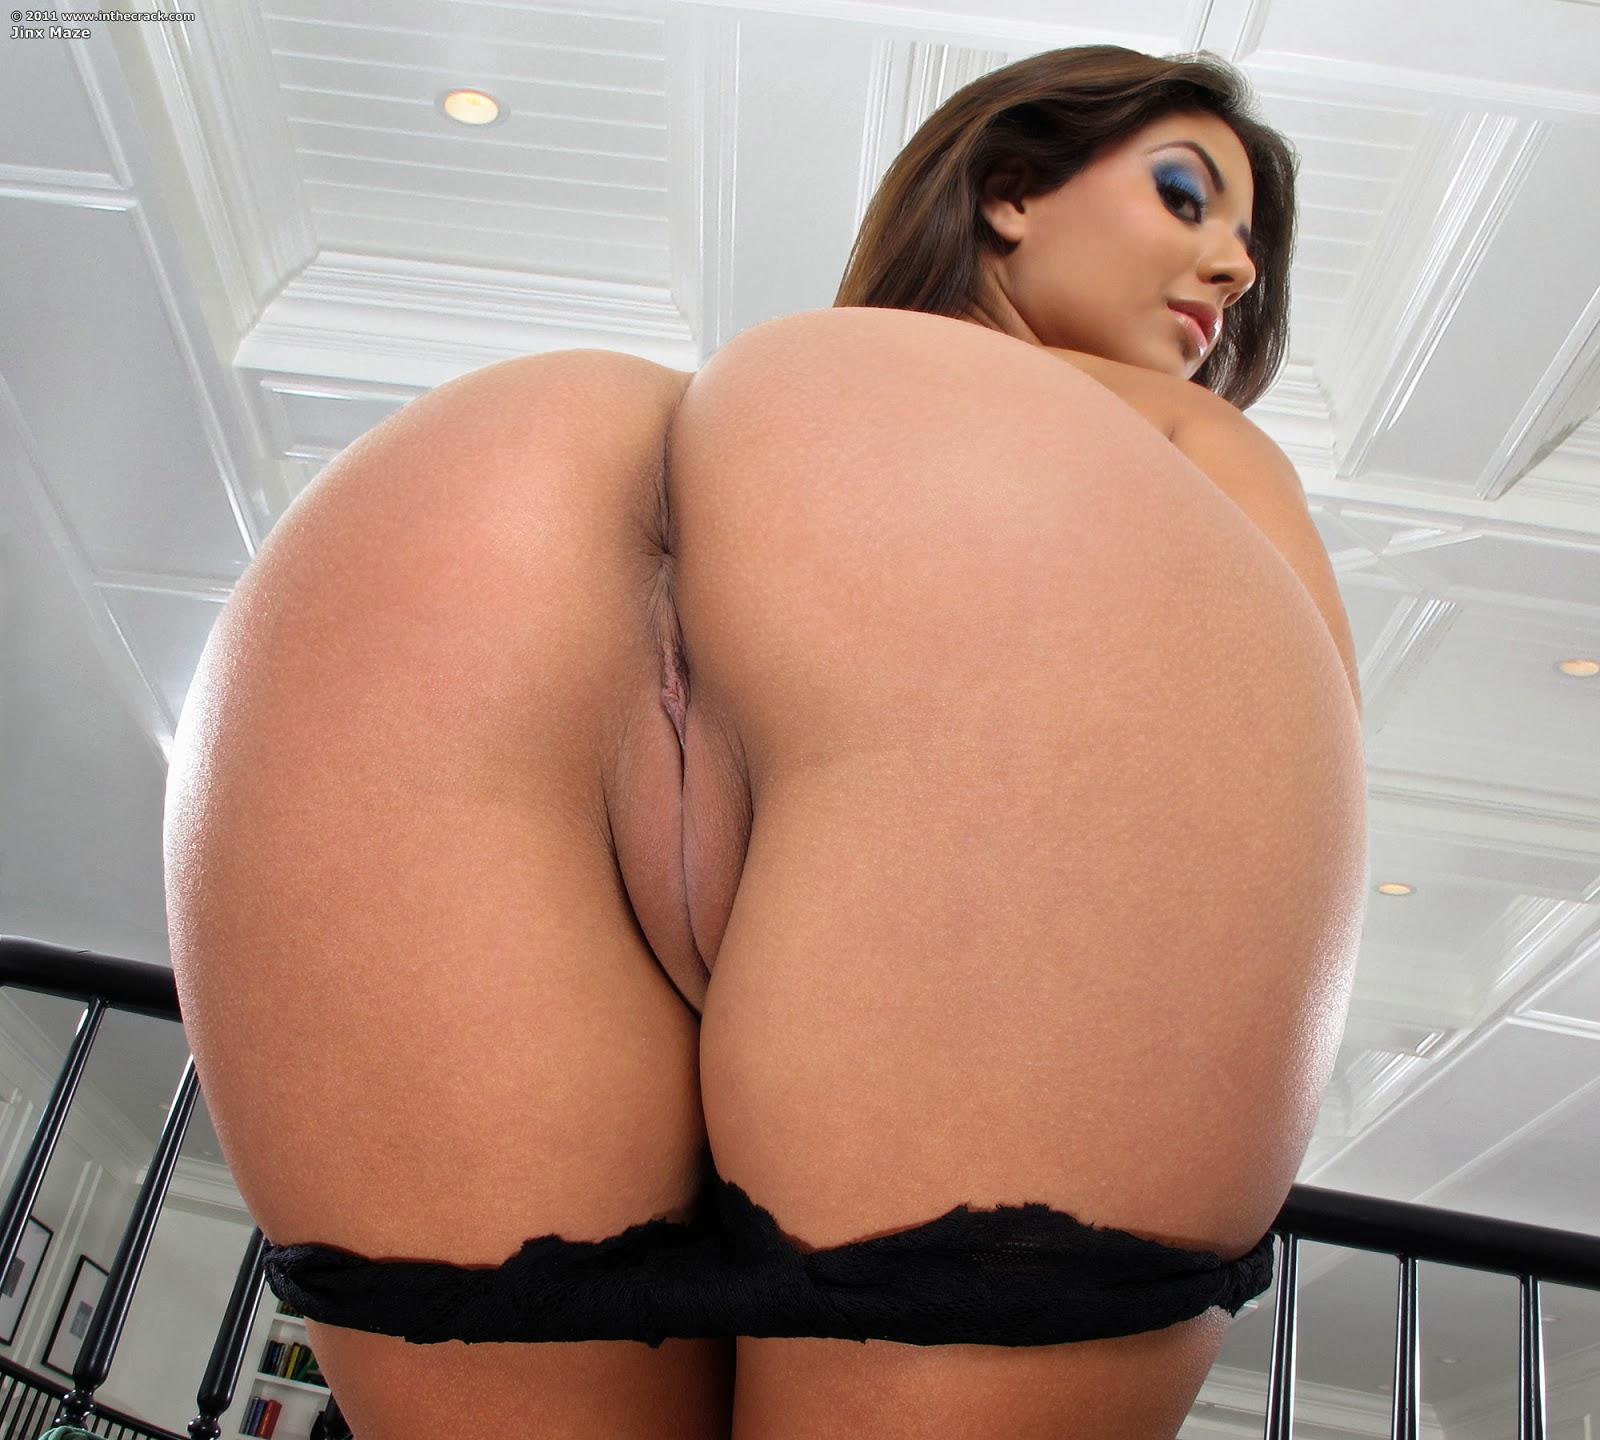 Jynx Maze, rear view. Porn Pic - EPORNER